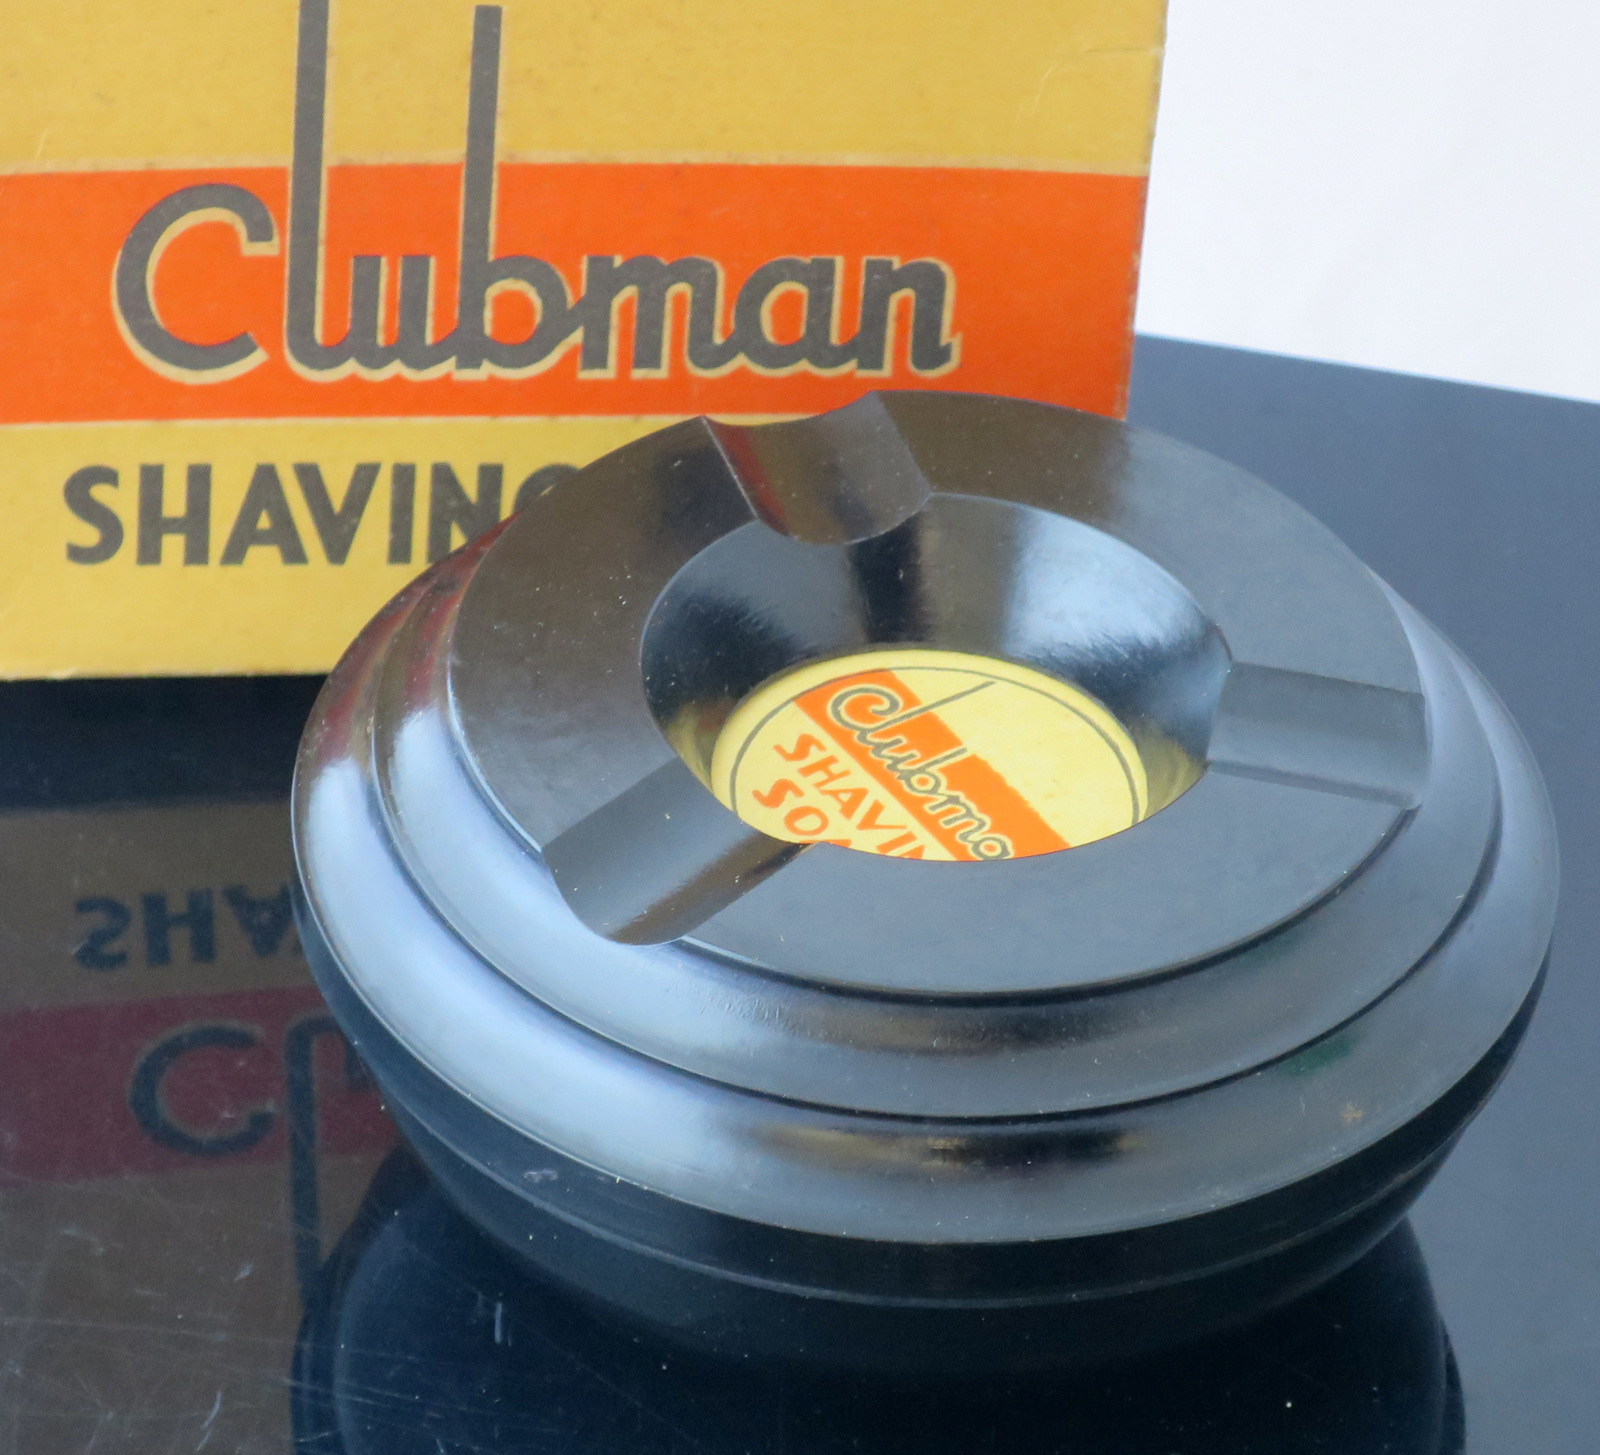 [Imagem: clubman-bakelite-shaving-bowl.jpg?i=-dJE...uNyjG5Kg~~]